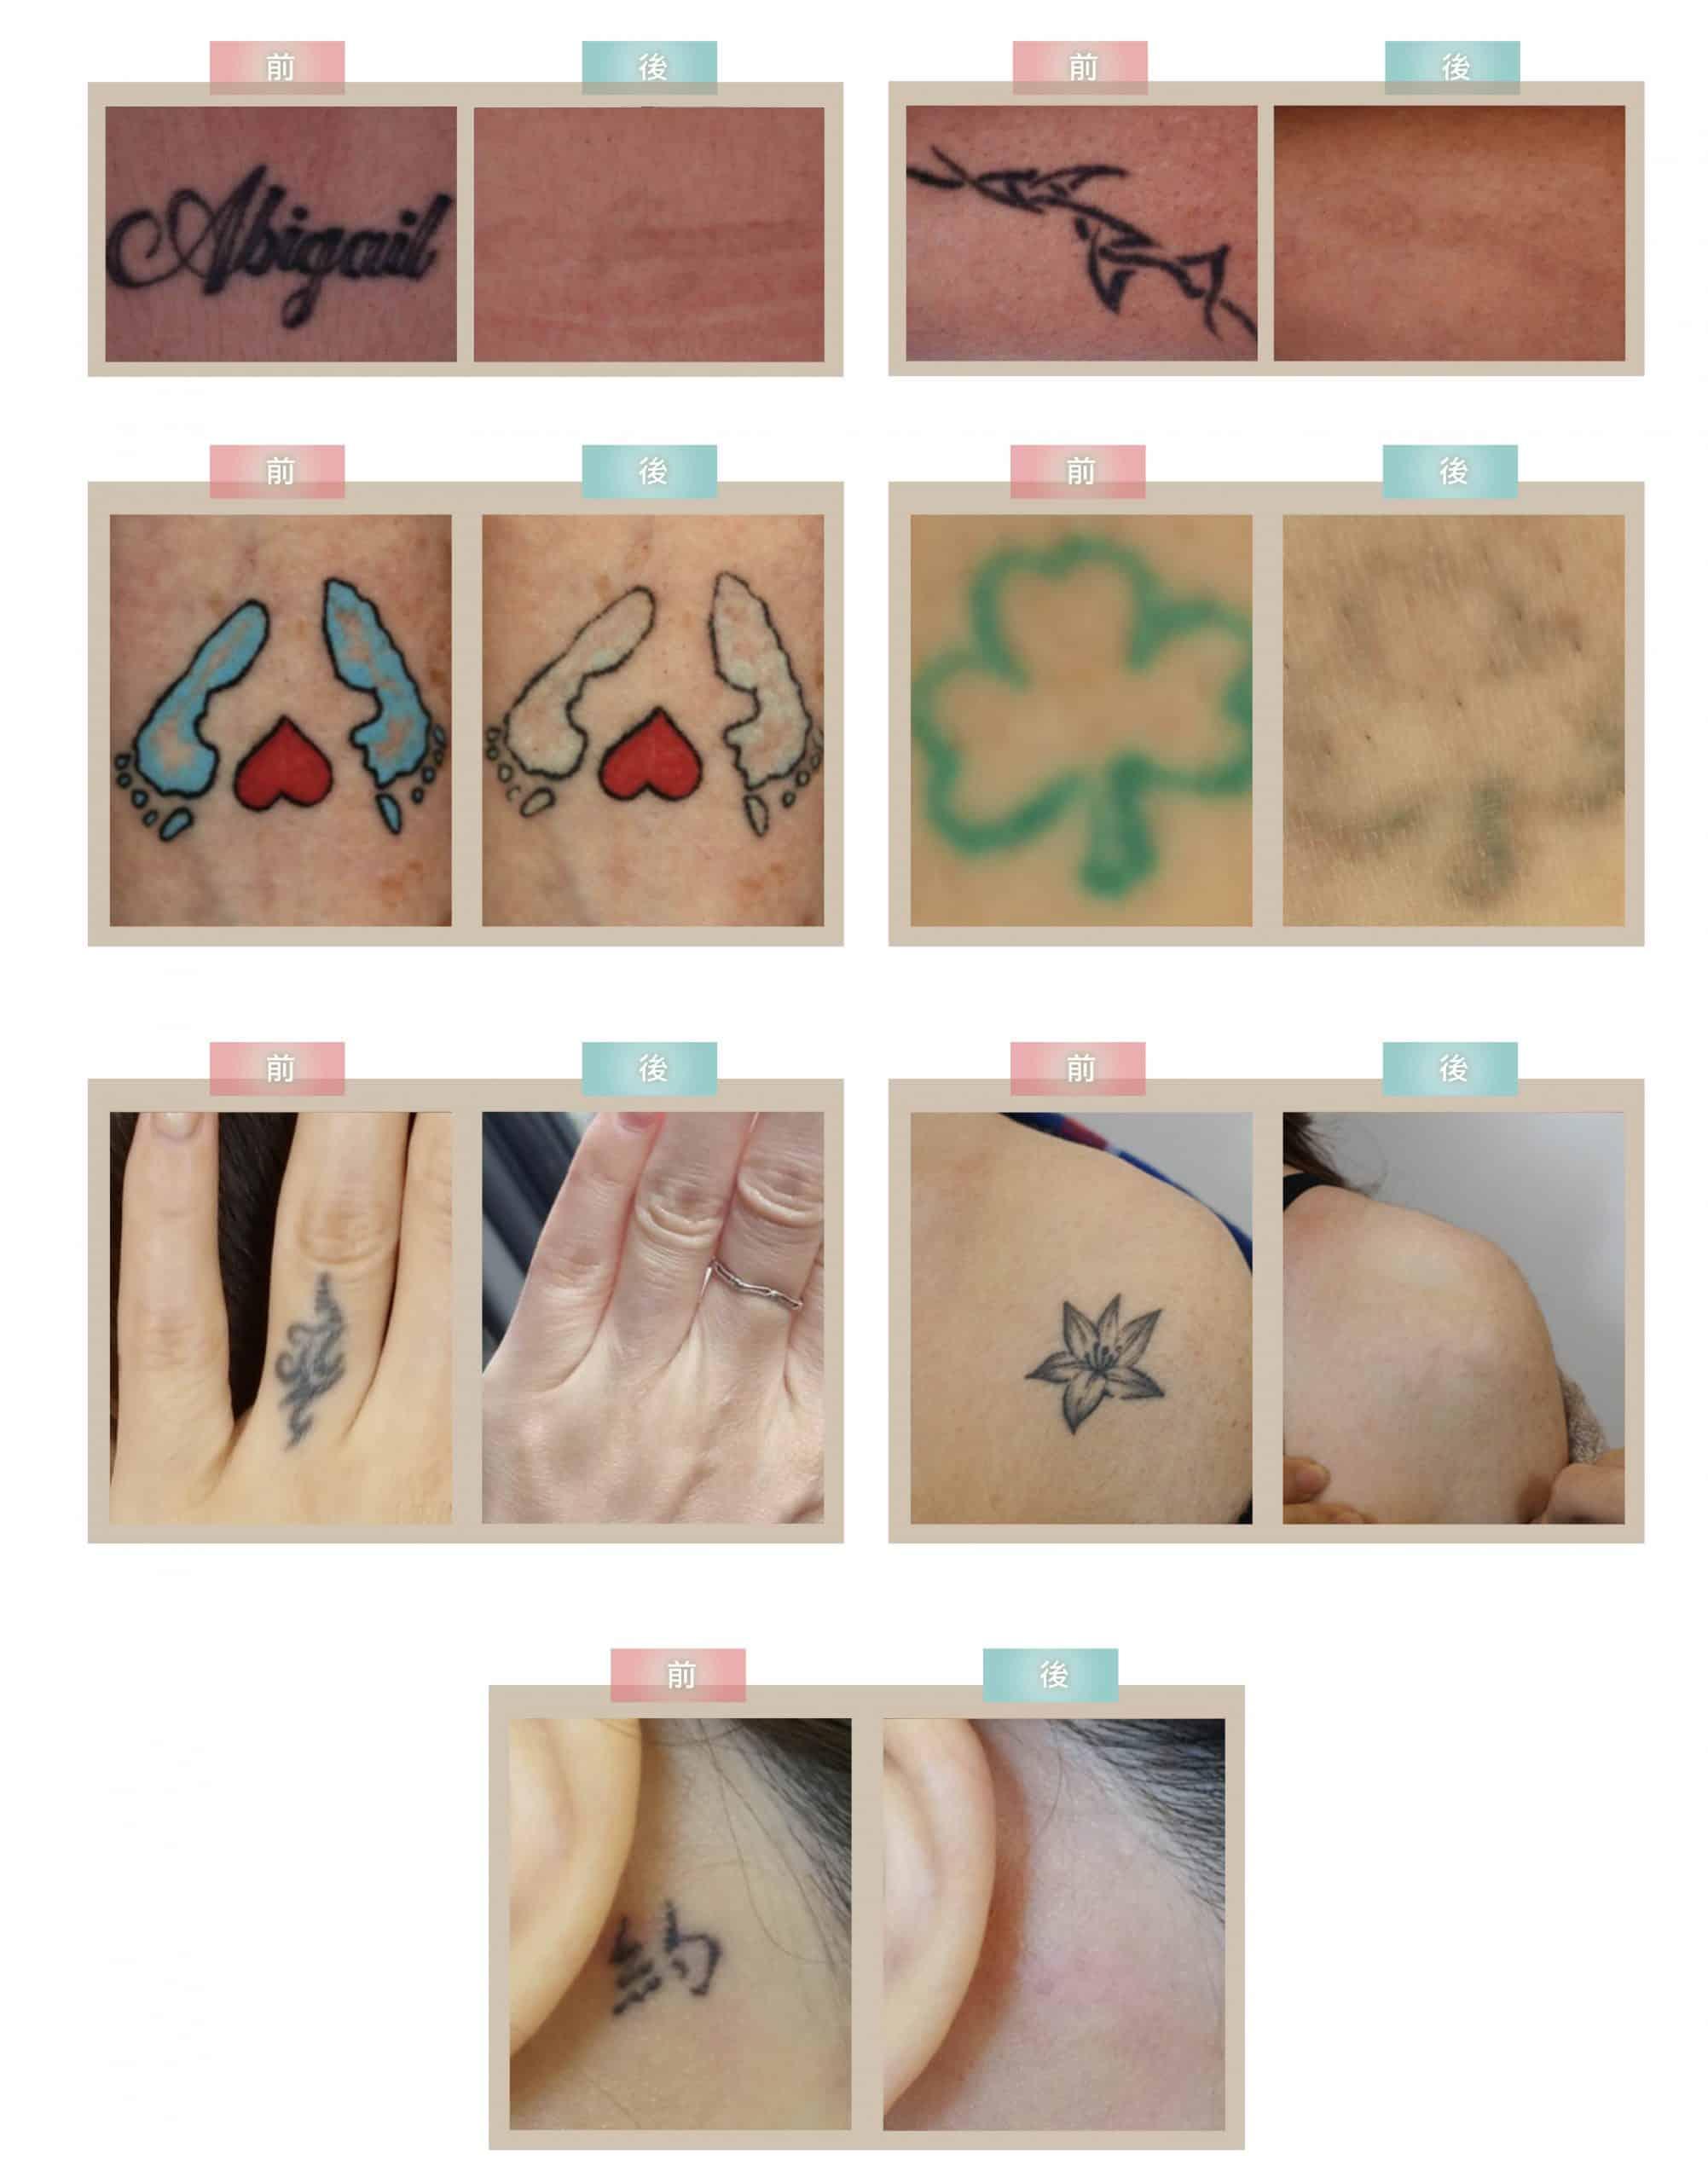 Picoway_tattoo Pico tattoo m 45 scaled